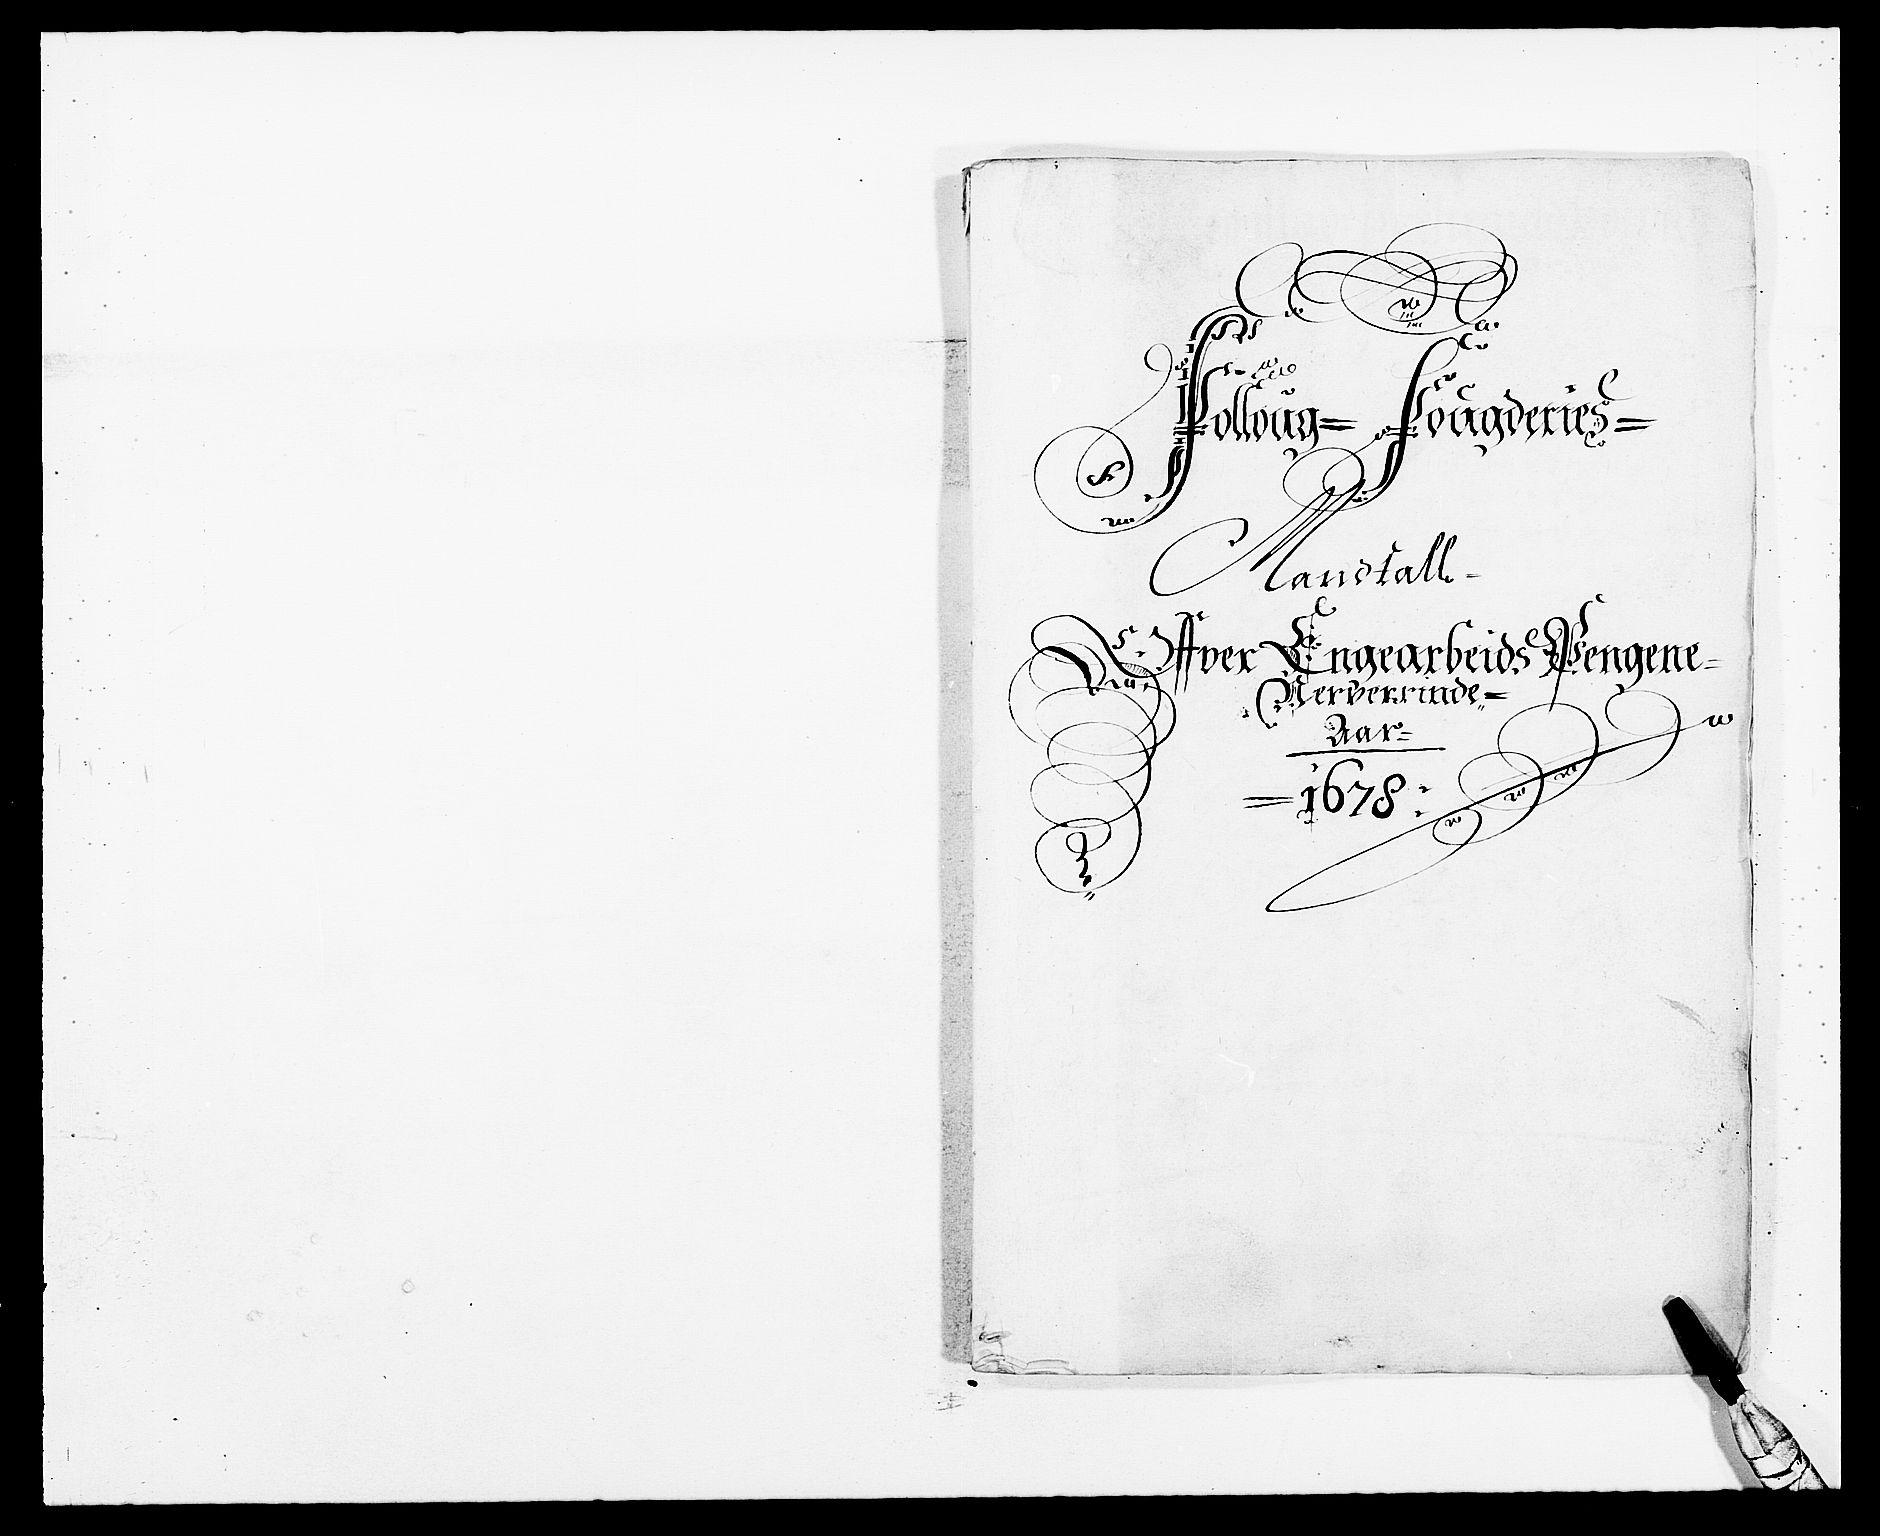 RA, Rentekammeret inntil 1814, Reviderte regnskaper, Fogderegnskap, R09/L0427: Fogderegnskap Follo, 1678, s. 154